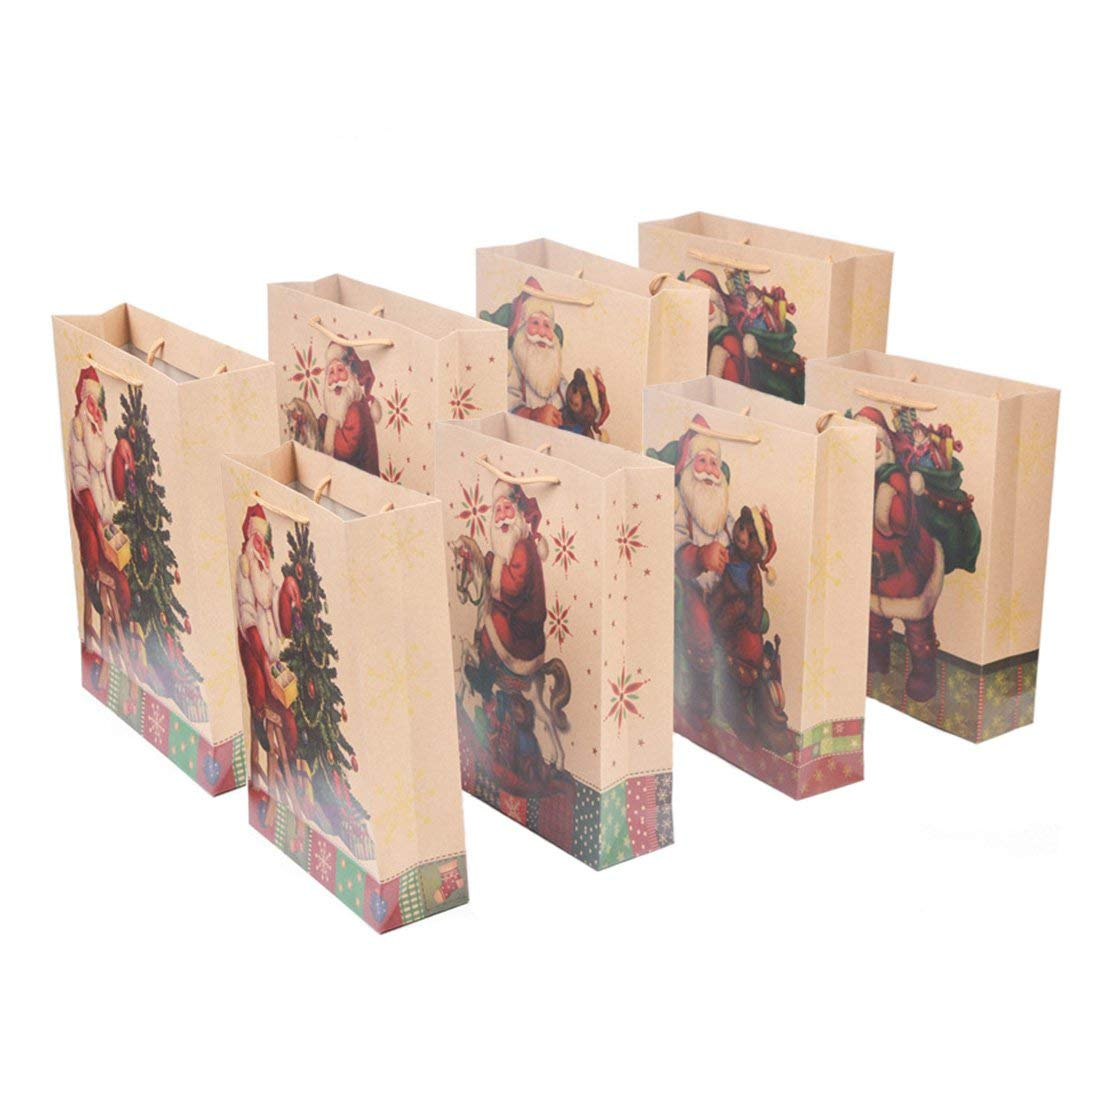 "Onener Set of 8 Medium Merry Christmas Kraft Paper Gift Bags - 4 Different Santa & Christmas Tree Patterns Design Holiday Gift Wrap Festival Gift Set - 13"" x 9.5"" x 3.4""(Pack of 8)"